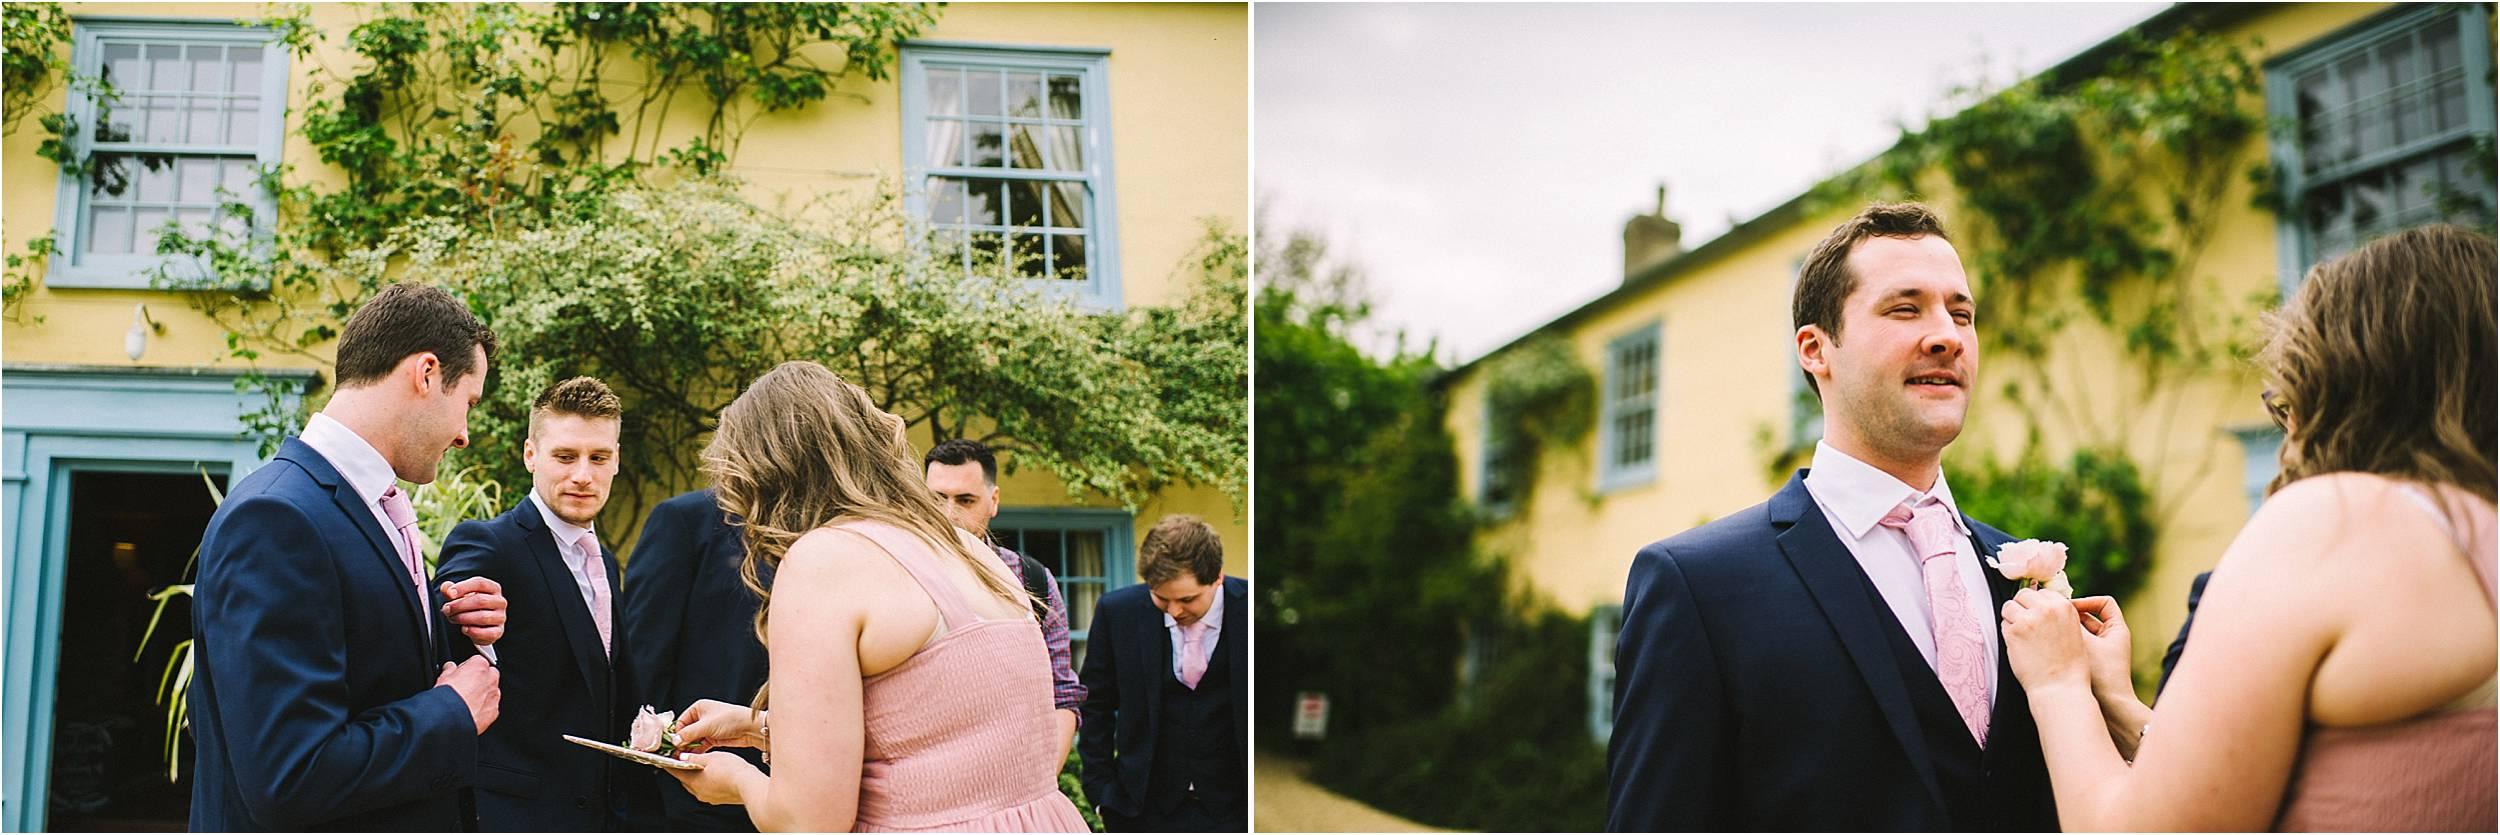 Cambridge Wedding Photographer_0043.jpg